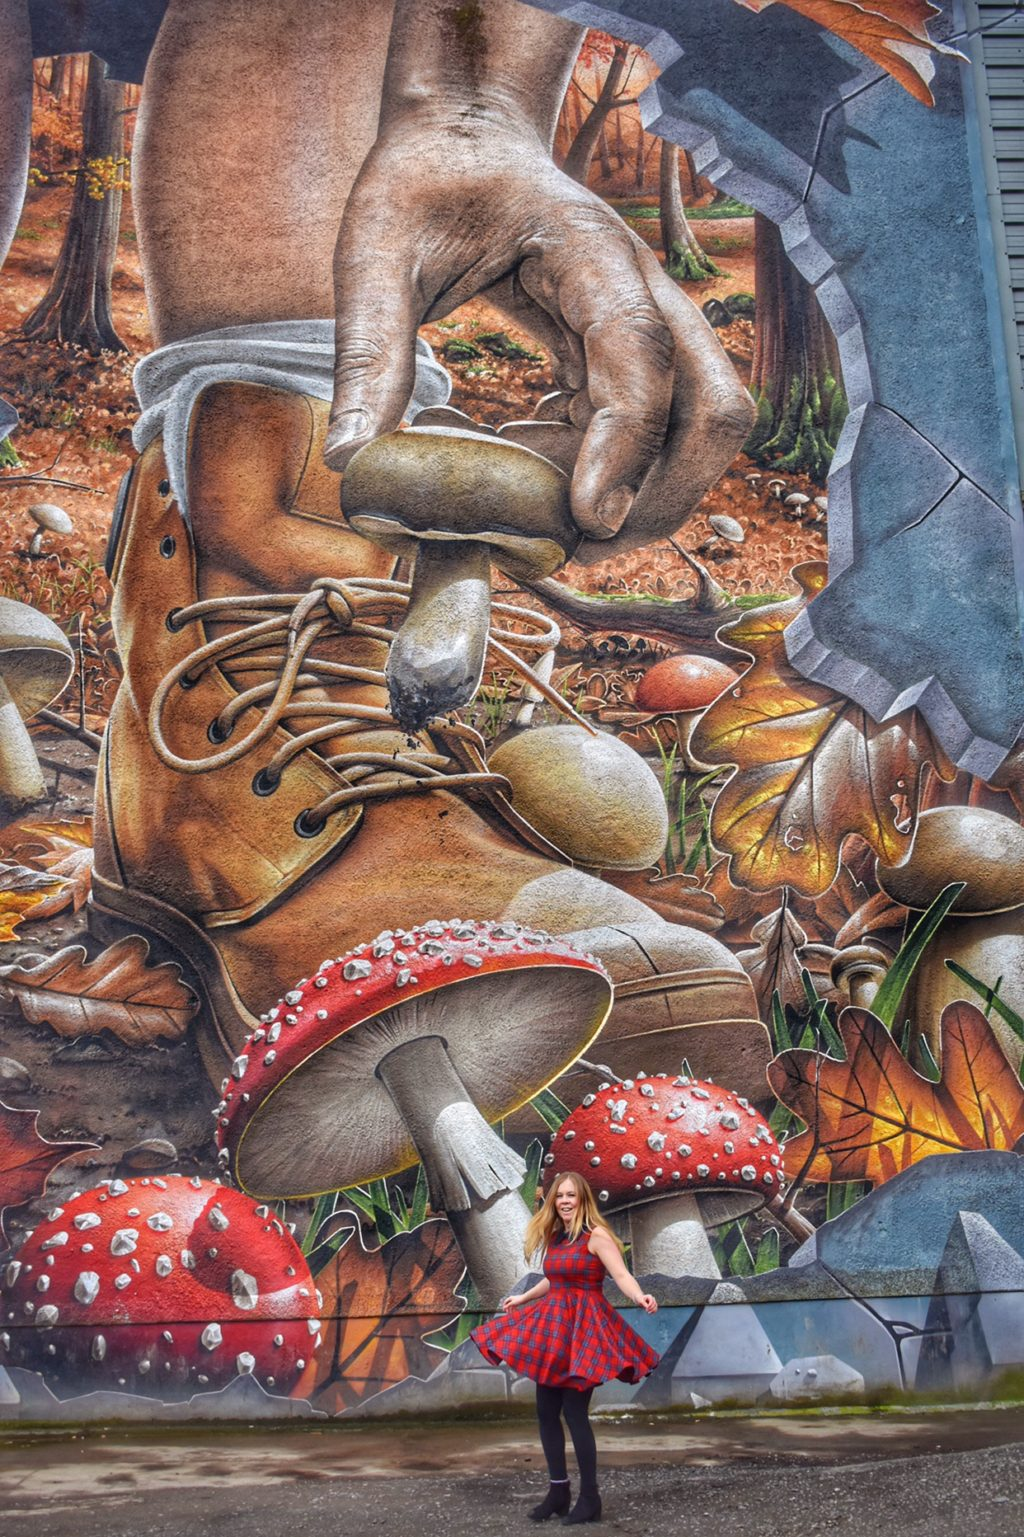 Glasgow Street Art Scotland, Fellow Glasgow Residents Mural